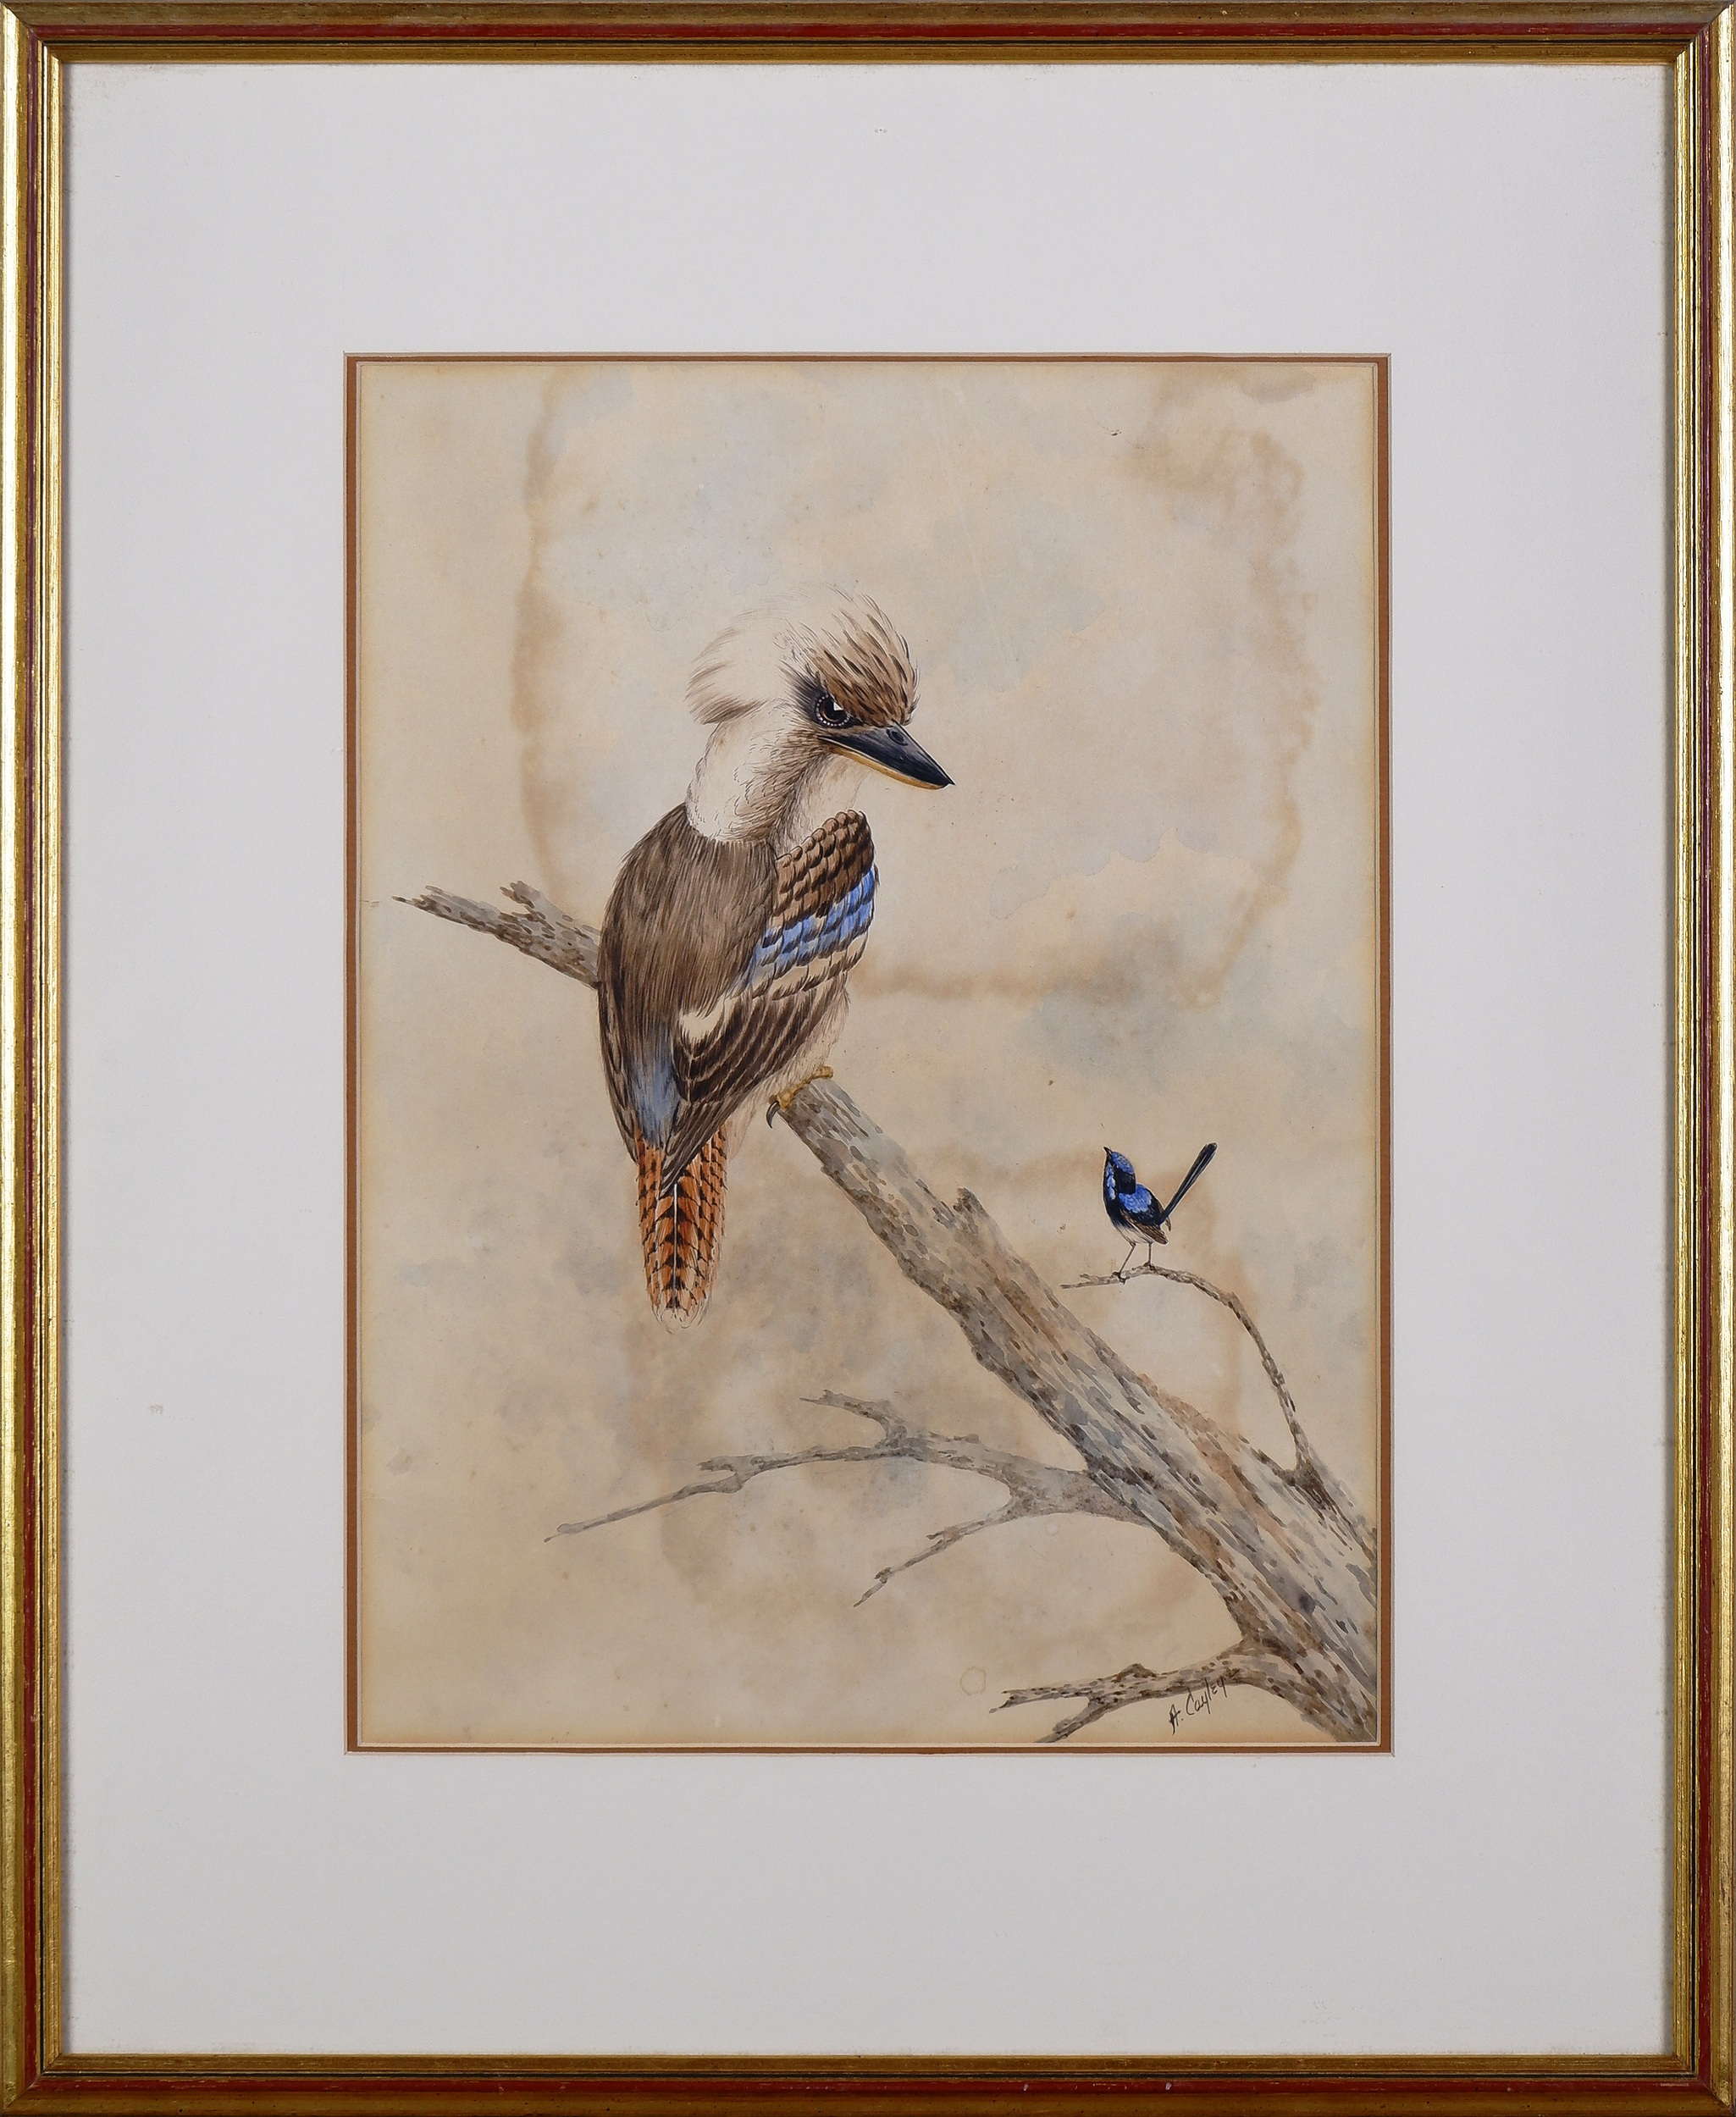 'Alice Cayley (Early 20th Century), Kookaburra and Wren, Watercolour'